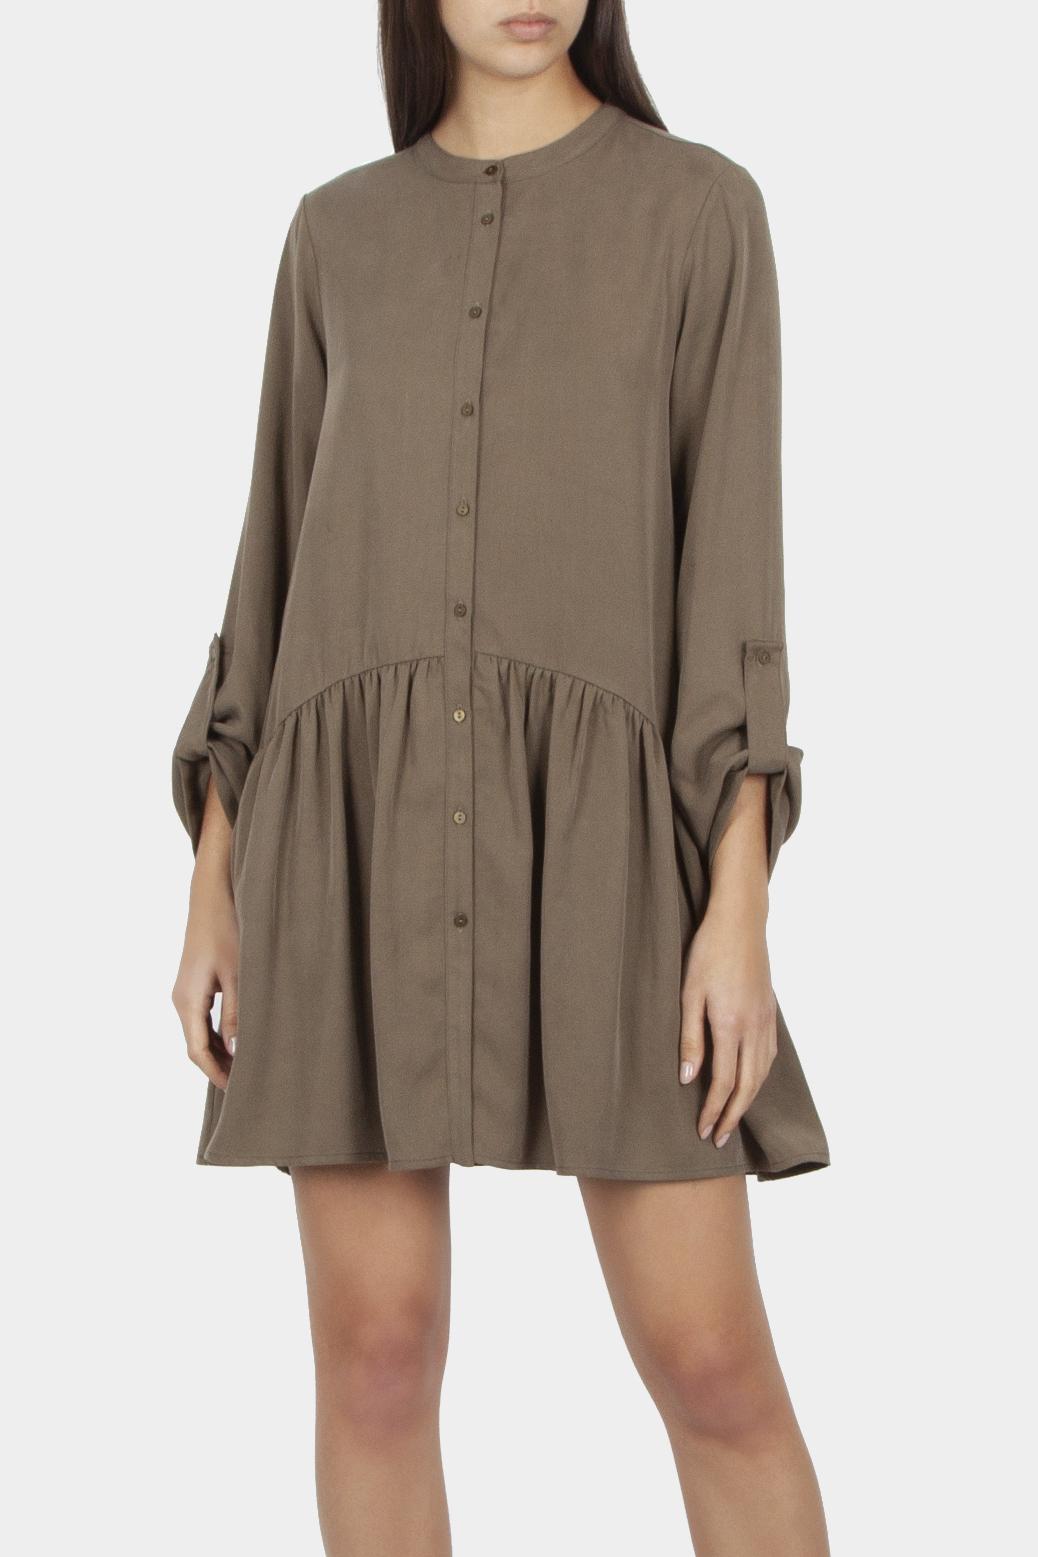 Dress in fabric